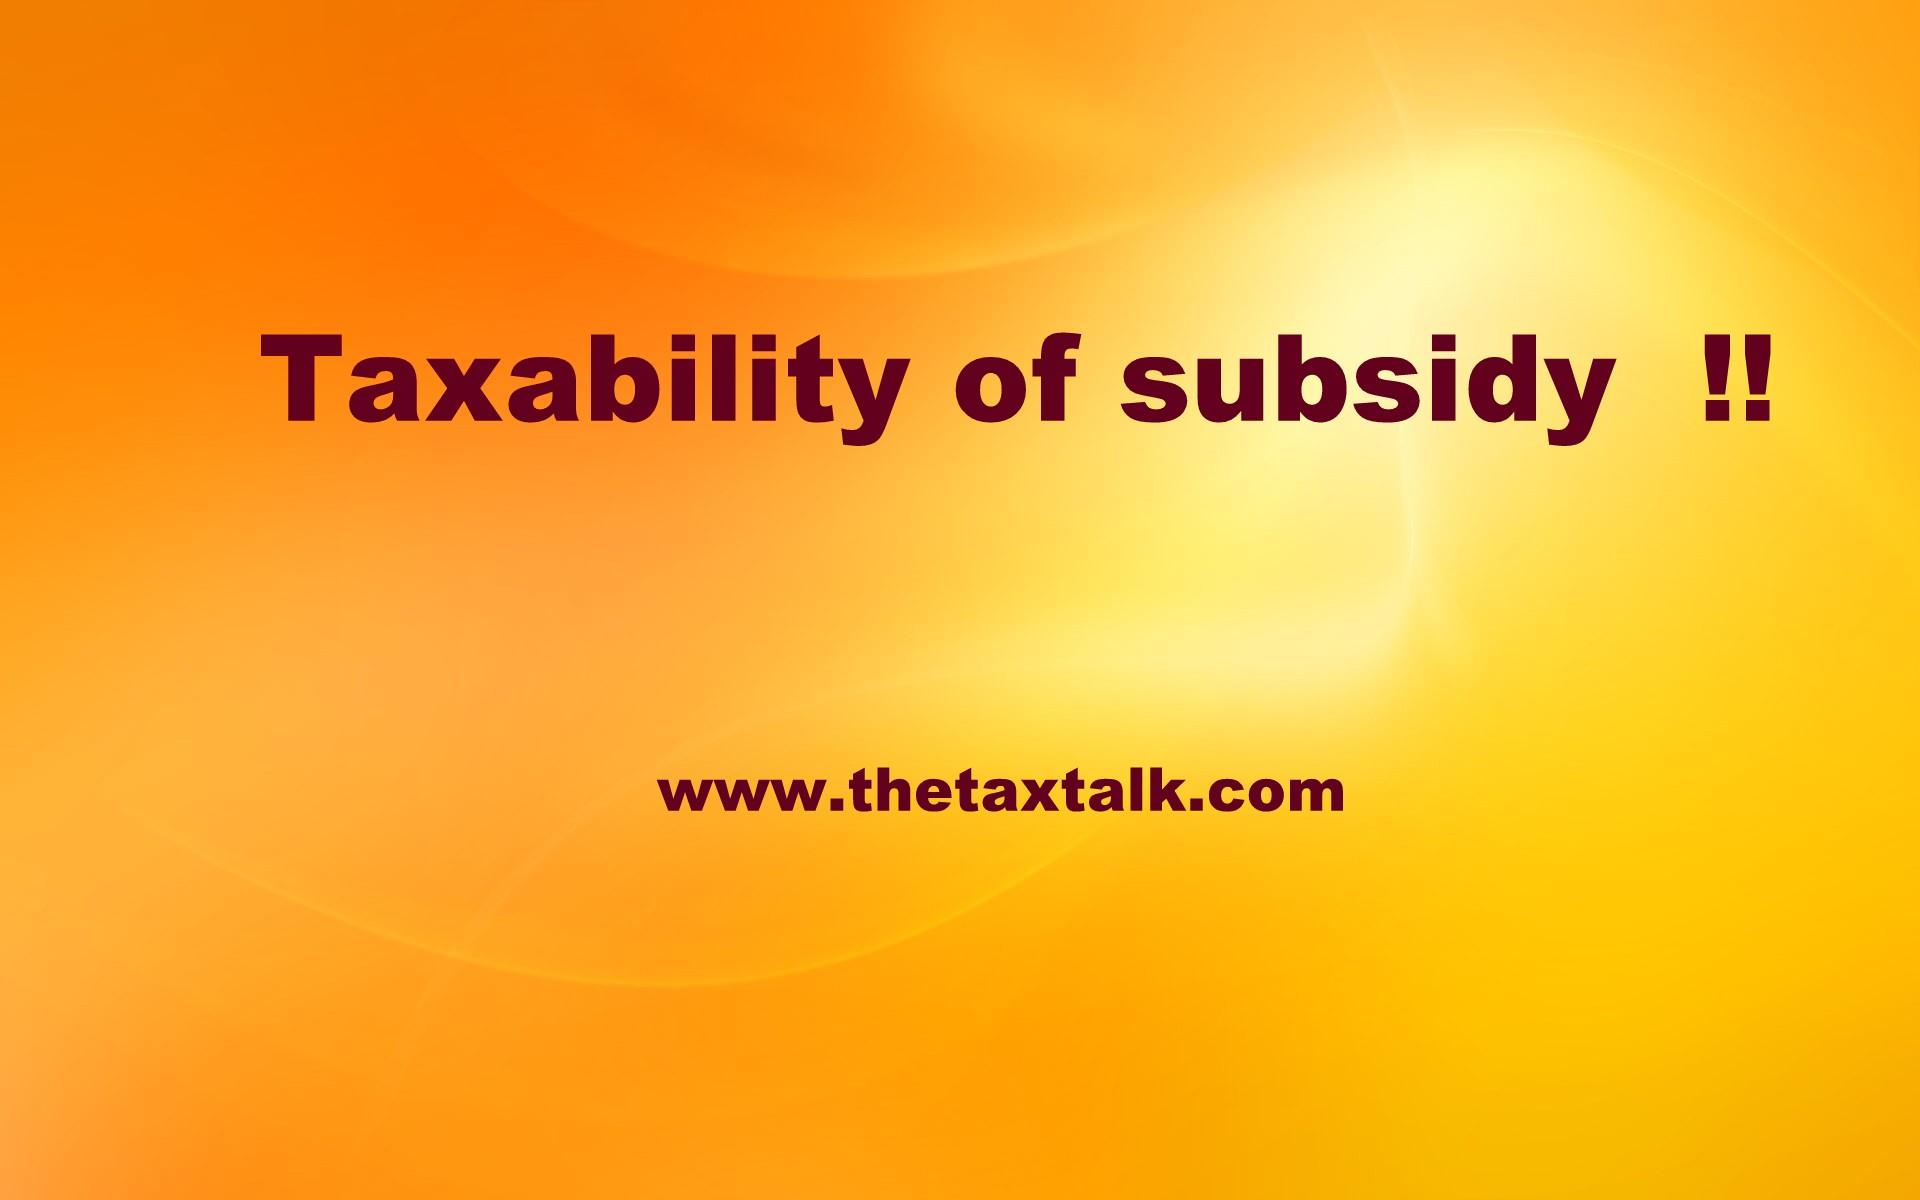 Taxability of subsidy !!